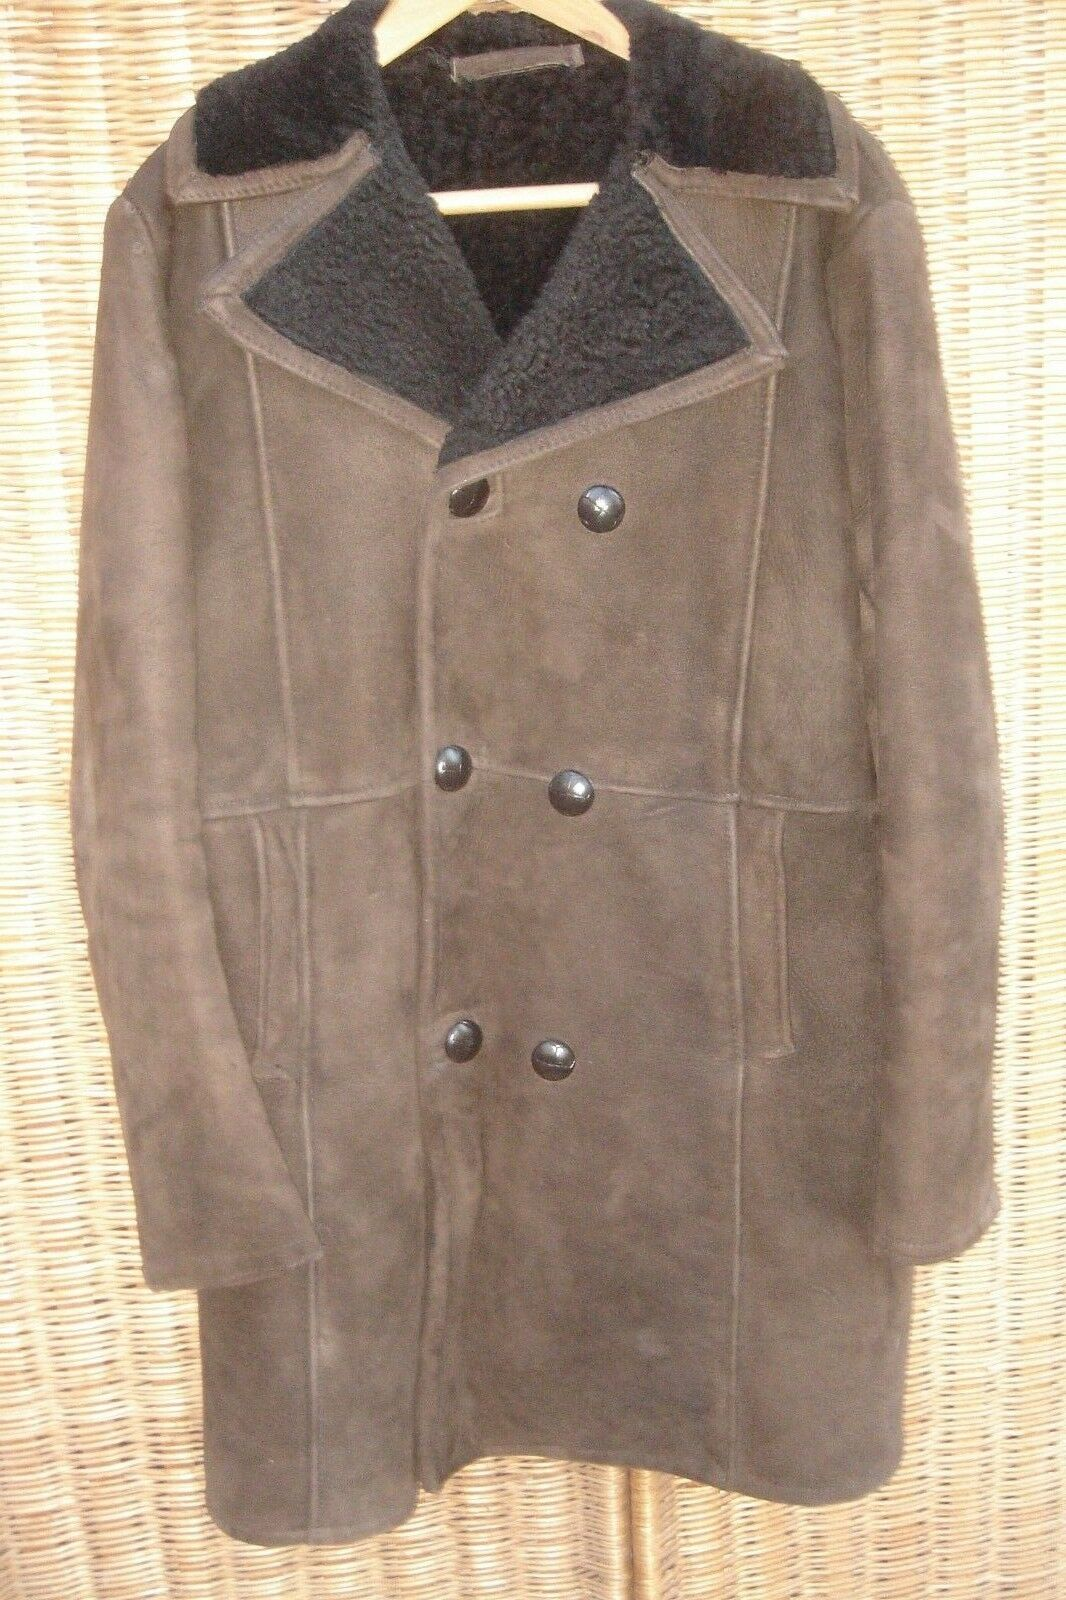 MEN'S DARK BROWN HEAVY 'GUARANTEED REAL SHEEPSKIN' COAT IN GOOD CONDITION